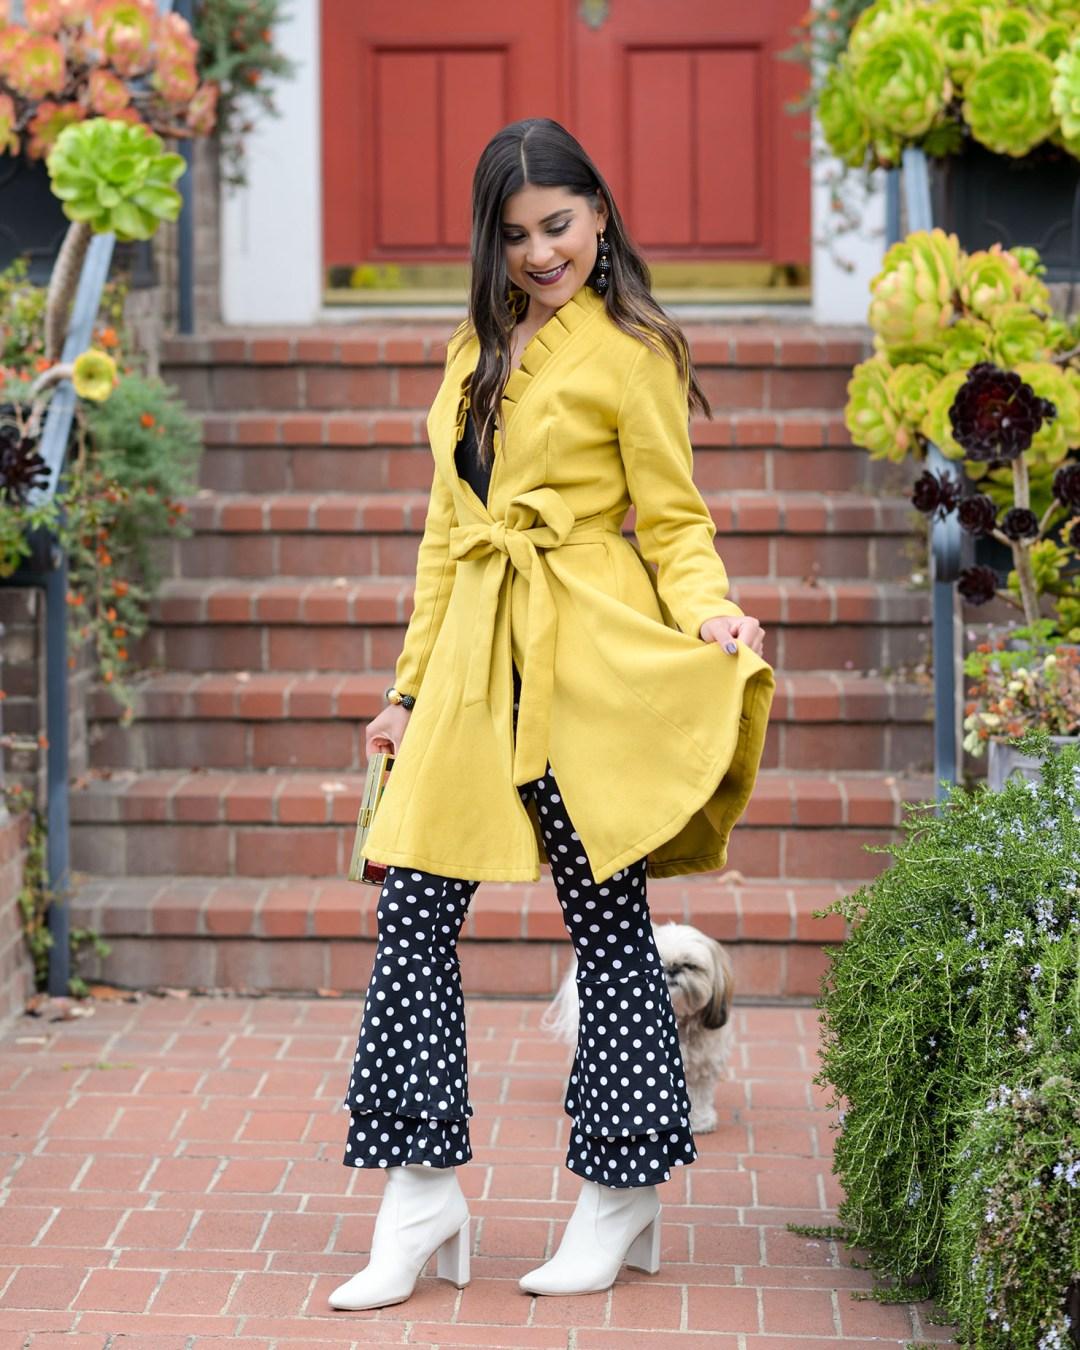 Lifestyle Blogger Kelsey Kaplan of Kelsey Kaplan Fashion wearing chartreuse coat dress and white Stuart Weitzman boots